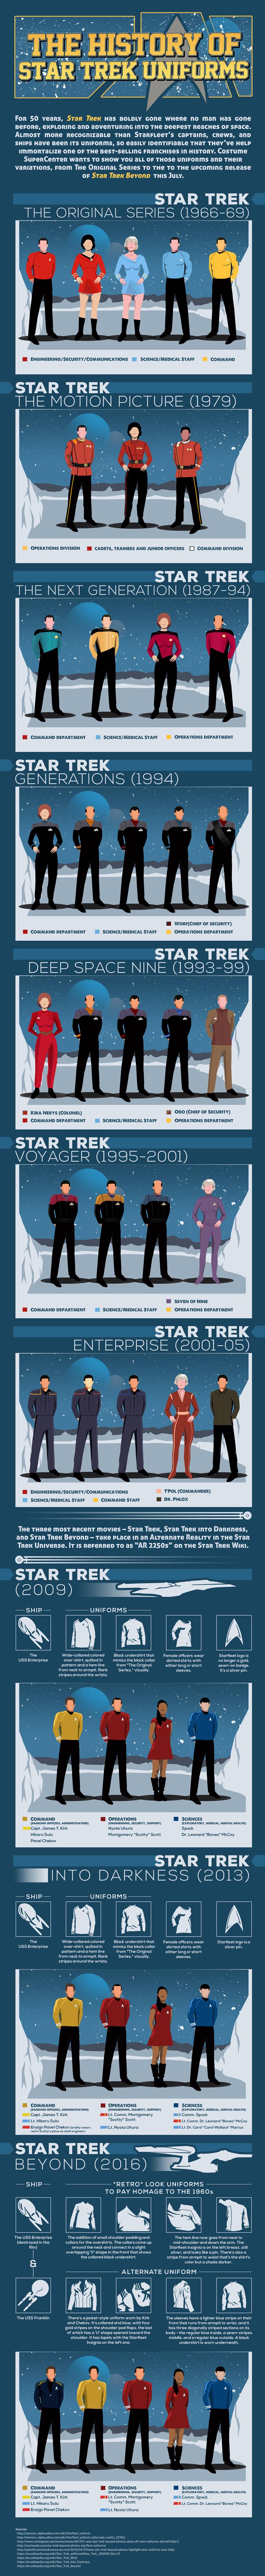 historia-star-trek-uniforms